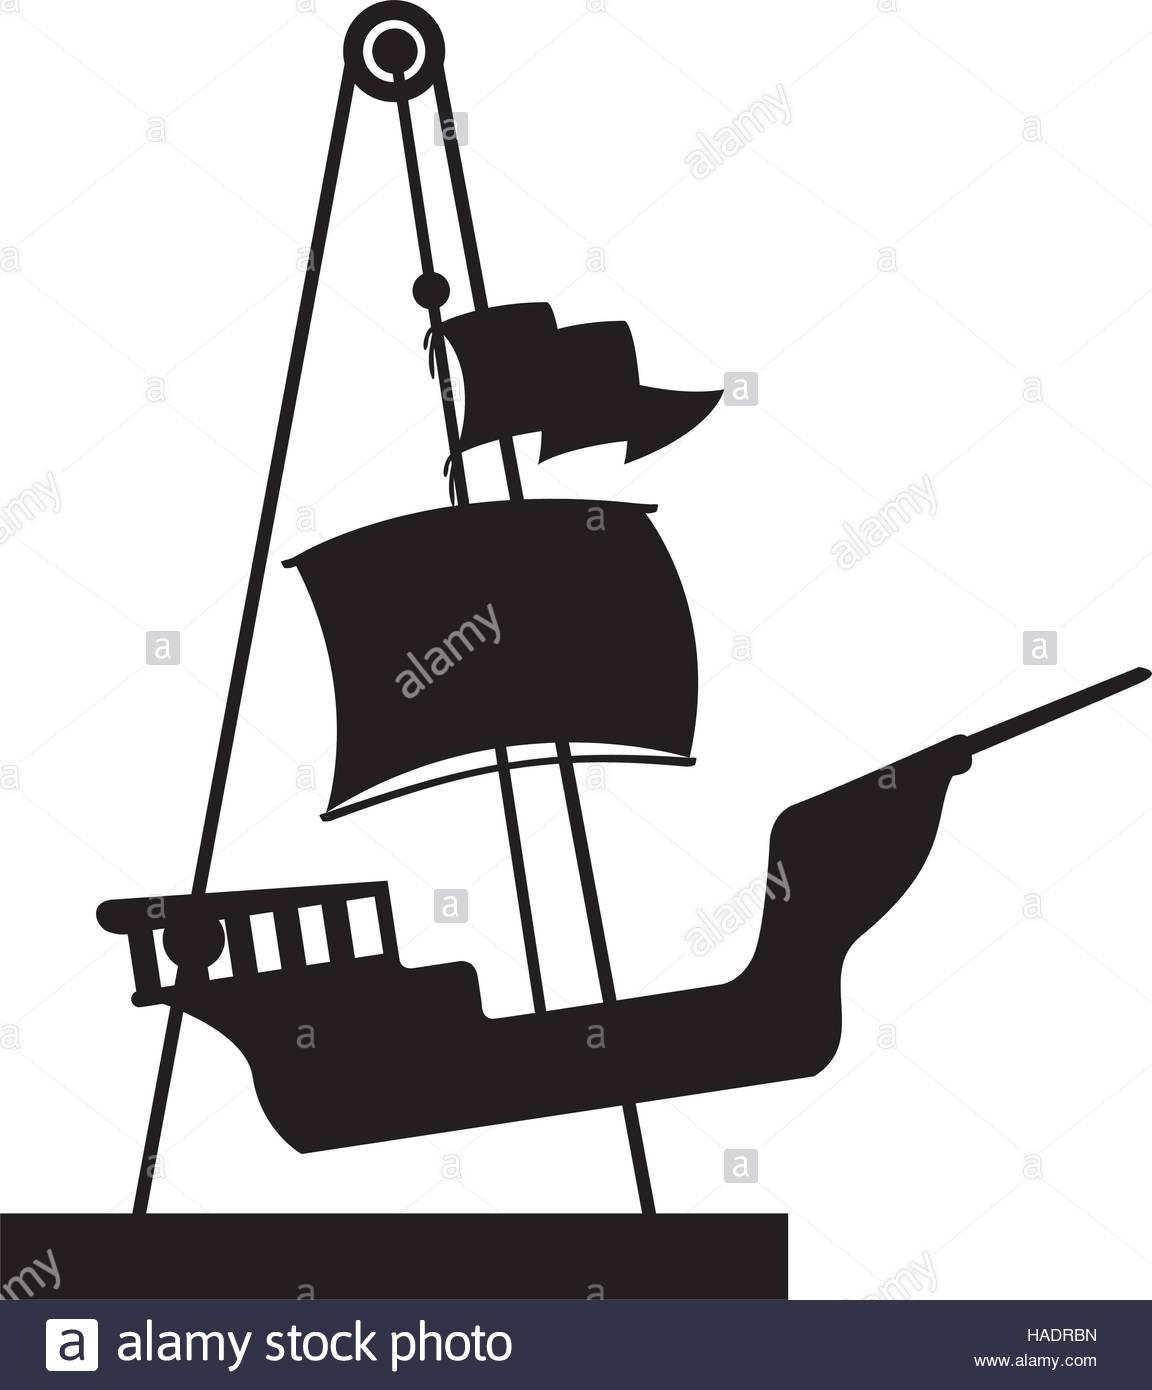 1152x1390 Silhouette Amusement Park Pirate Ship Line Icon Vector